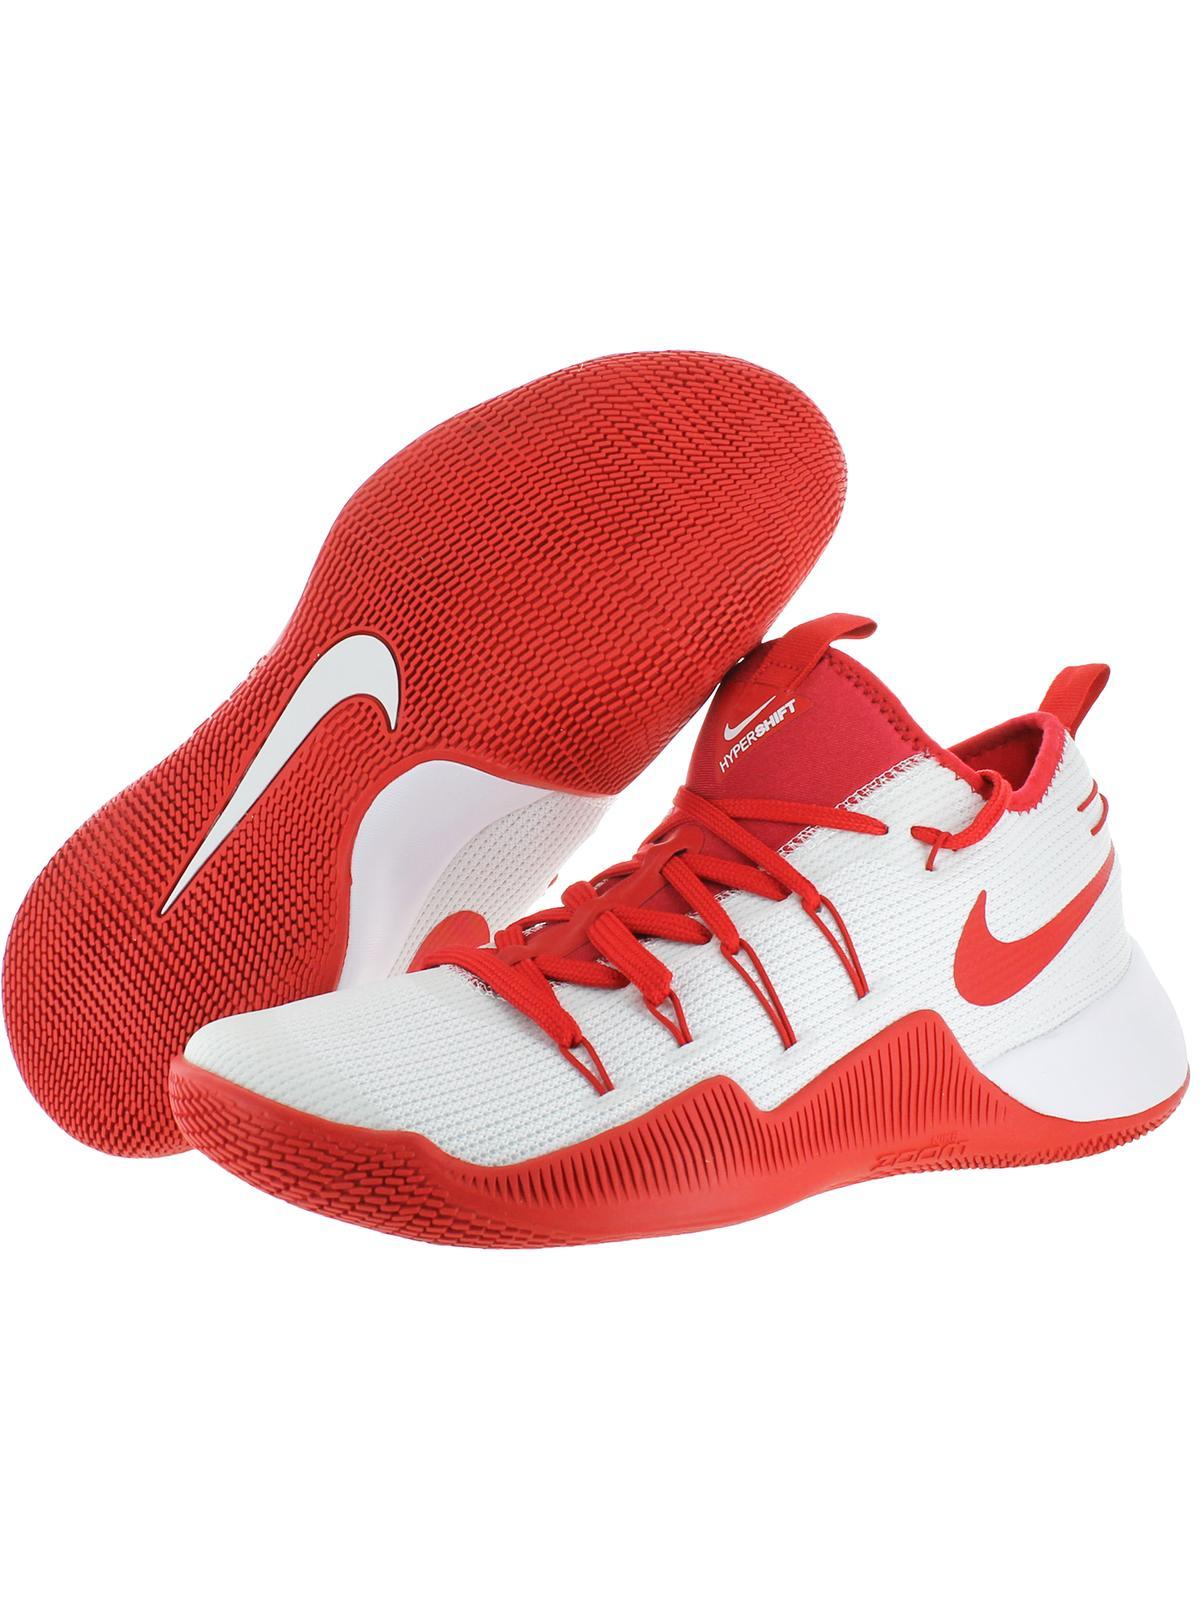 981d0d45b32 ... australia nike nike mens hypershift tb promo mid top nike zoom basketball  shoes walmart 213d9 7f676